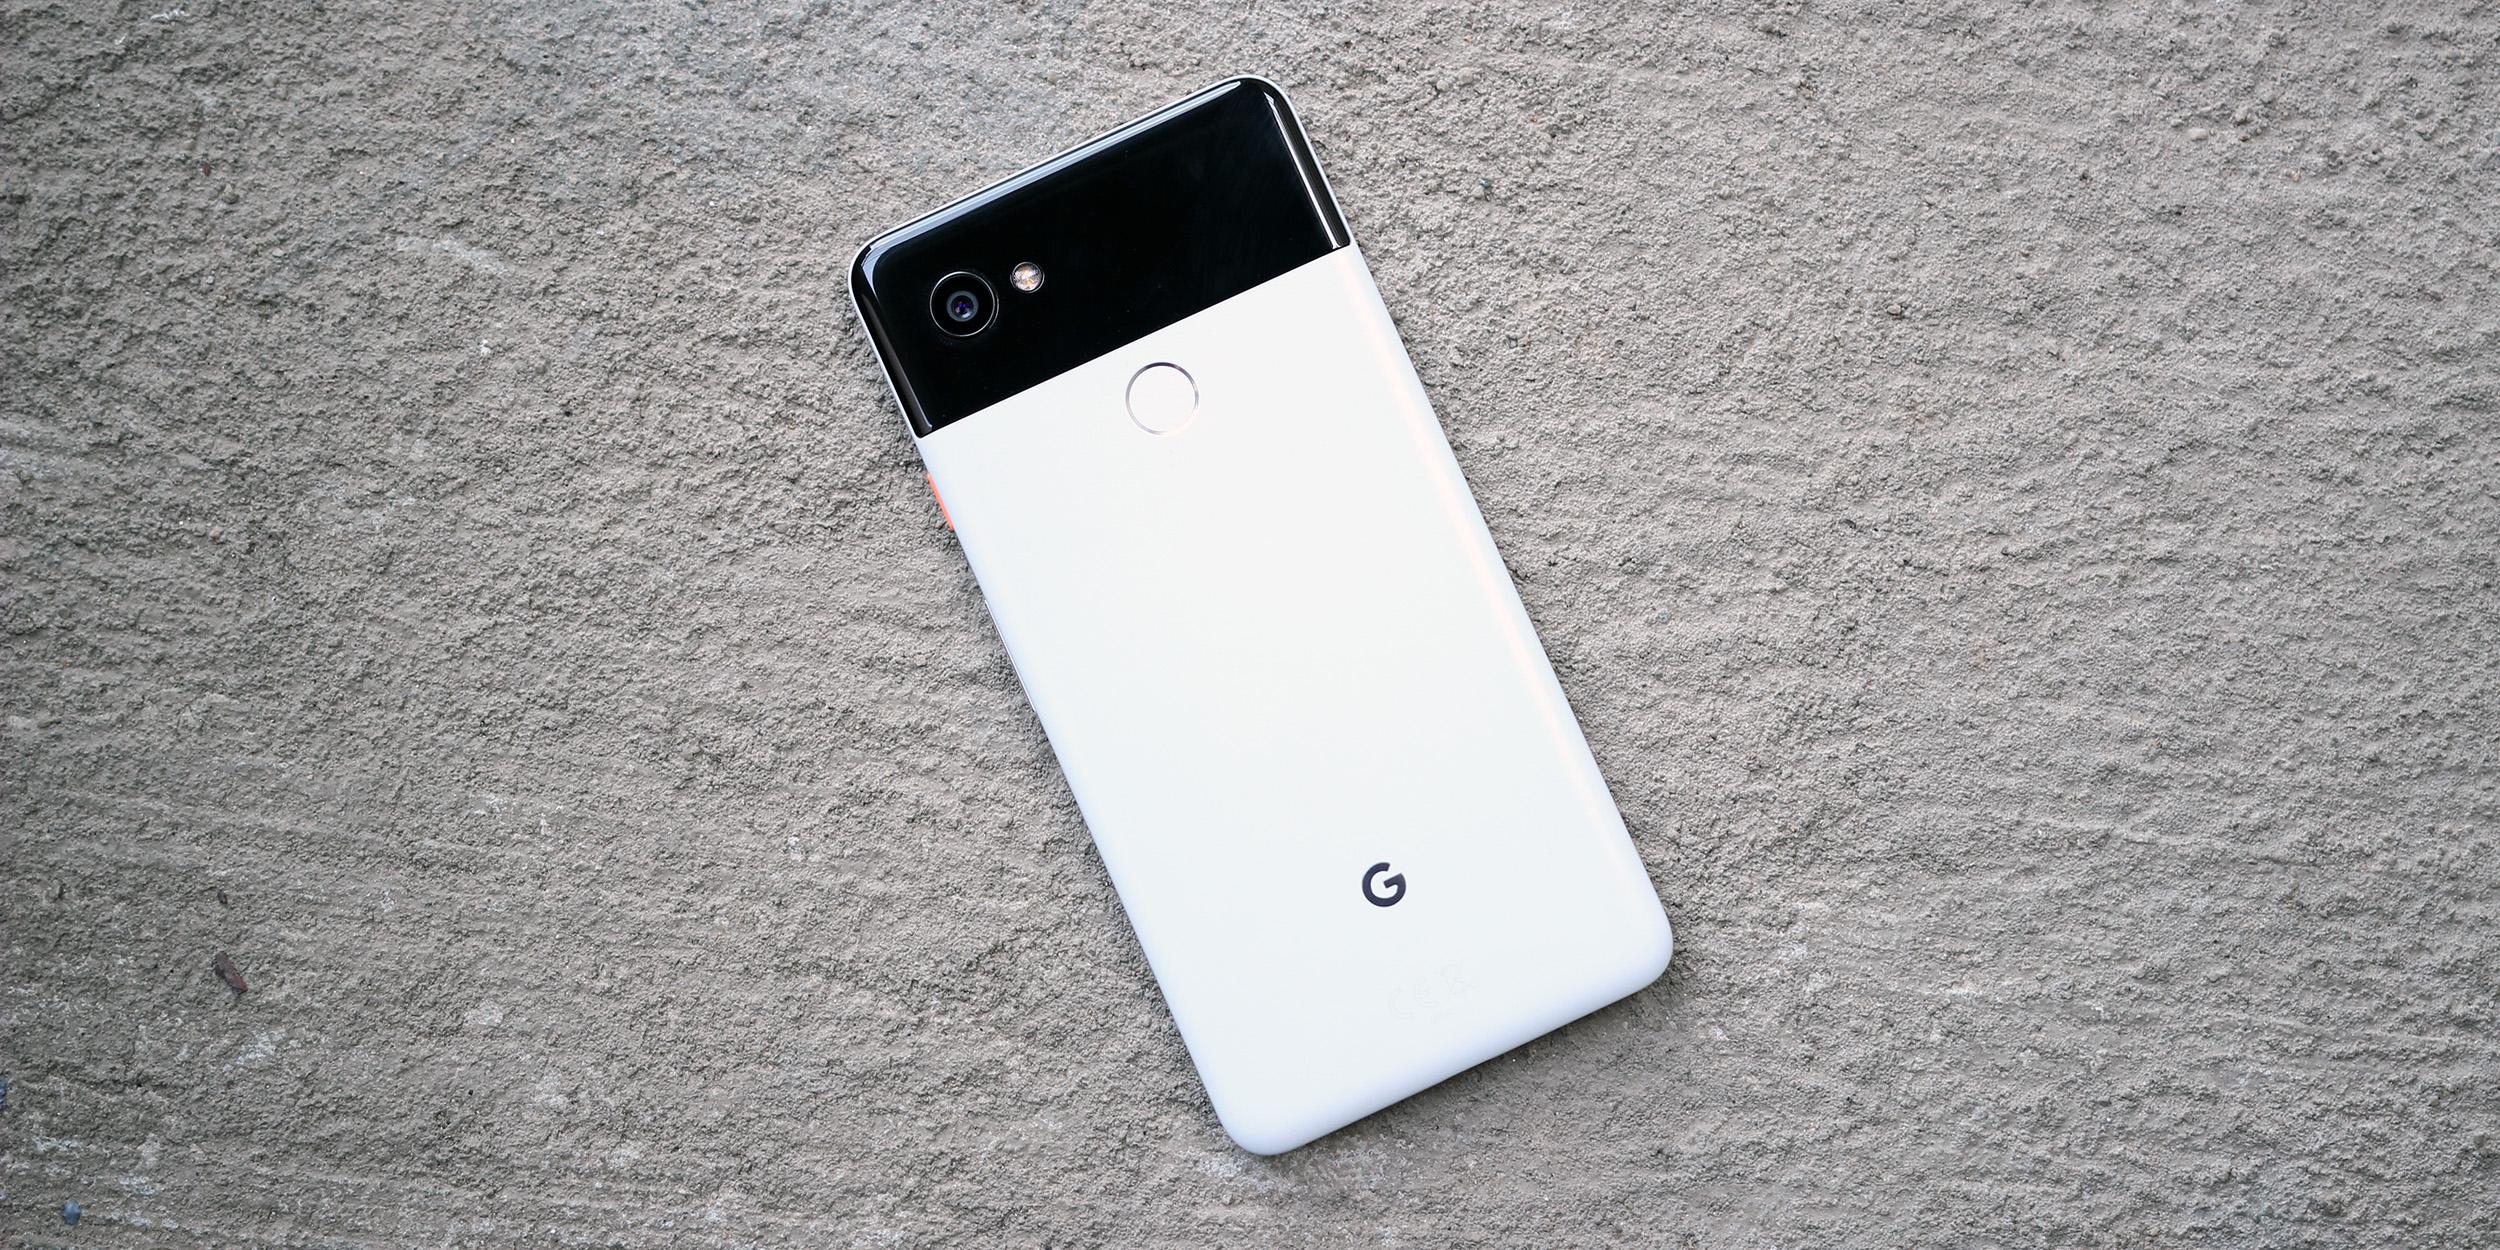 Upcoming Google Pixel 2 XL update will fix slow unlocking bug